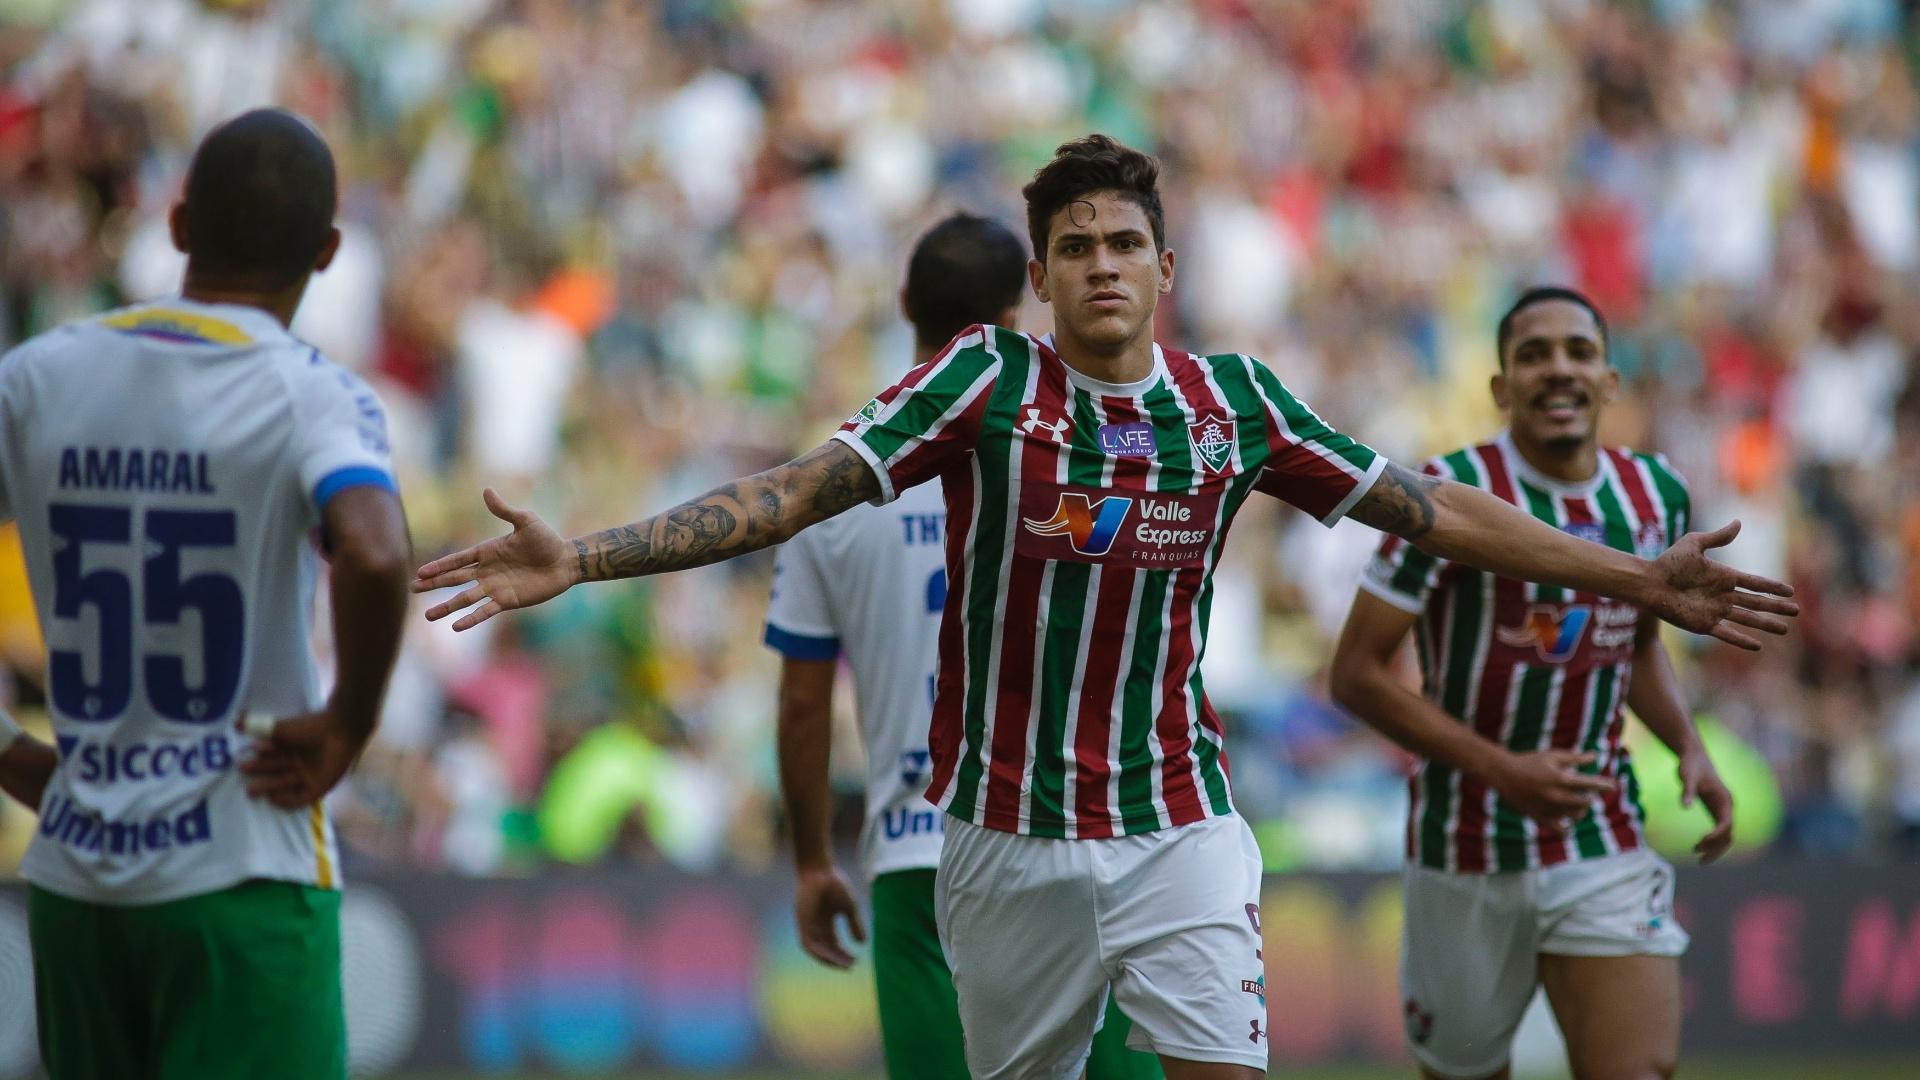 Pedro comemora gol do Fluminense contra a Chapecoense